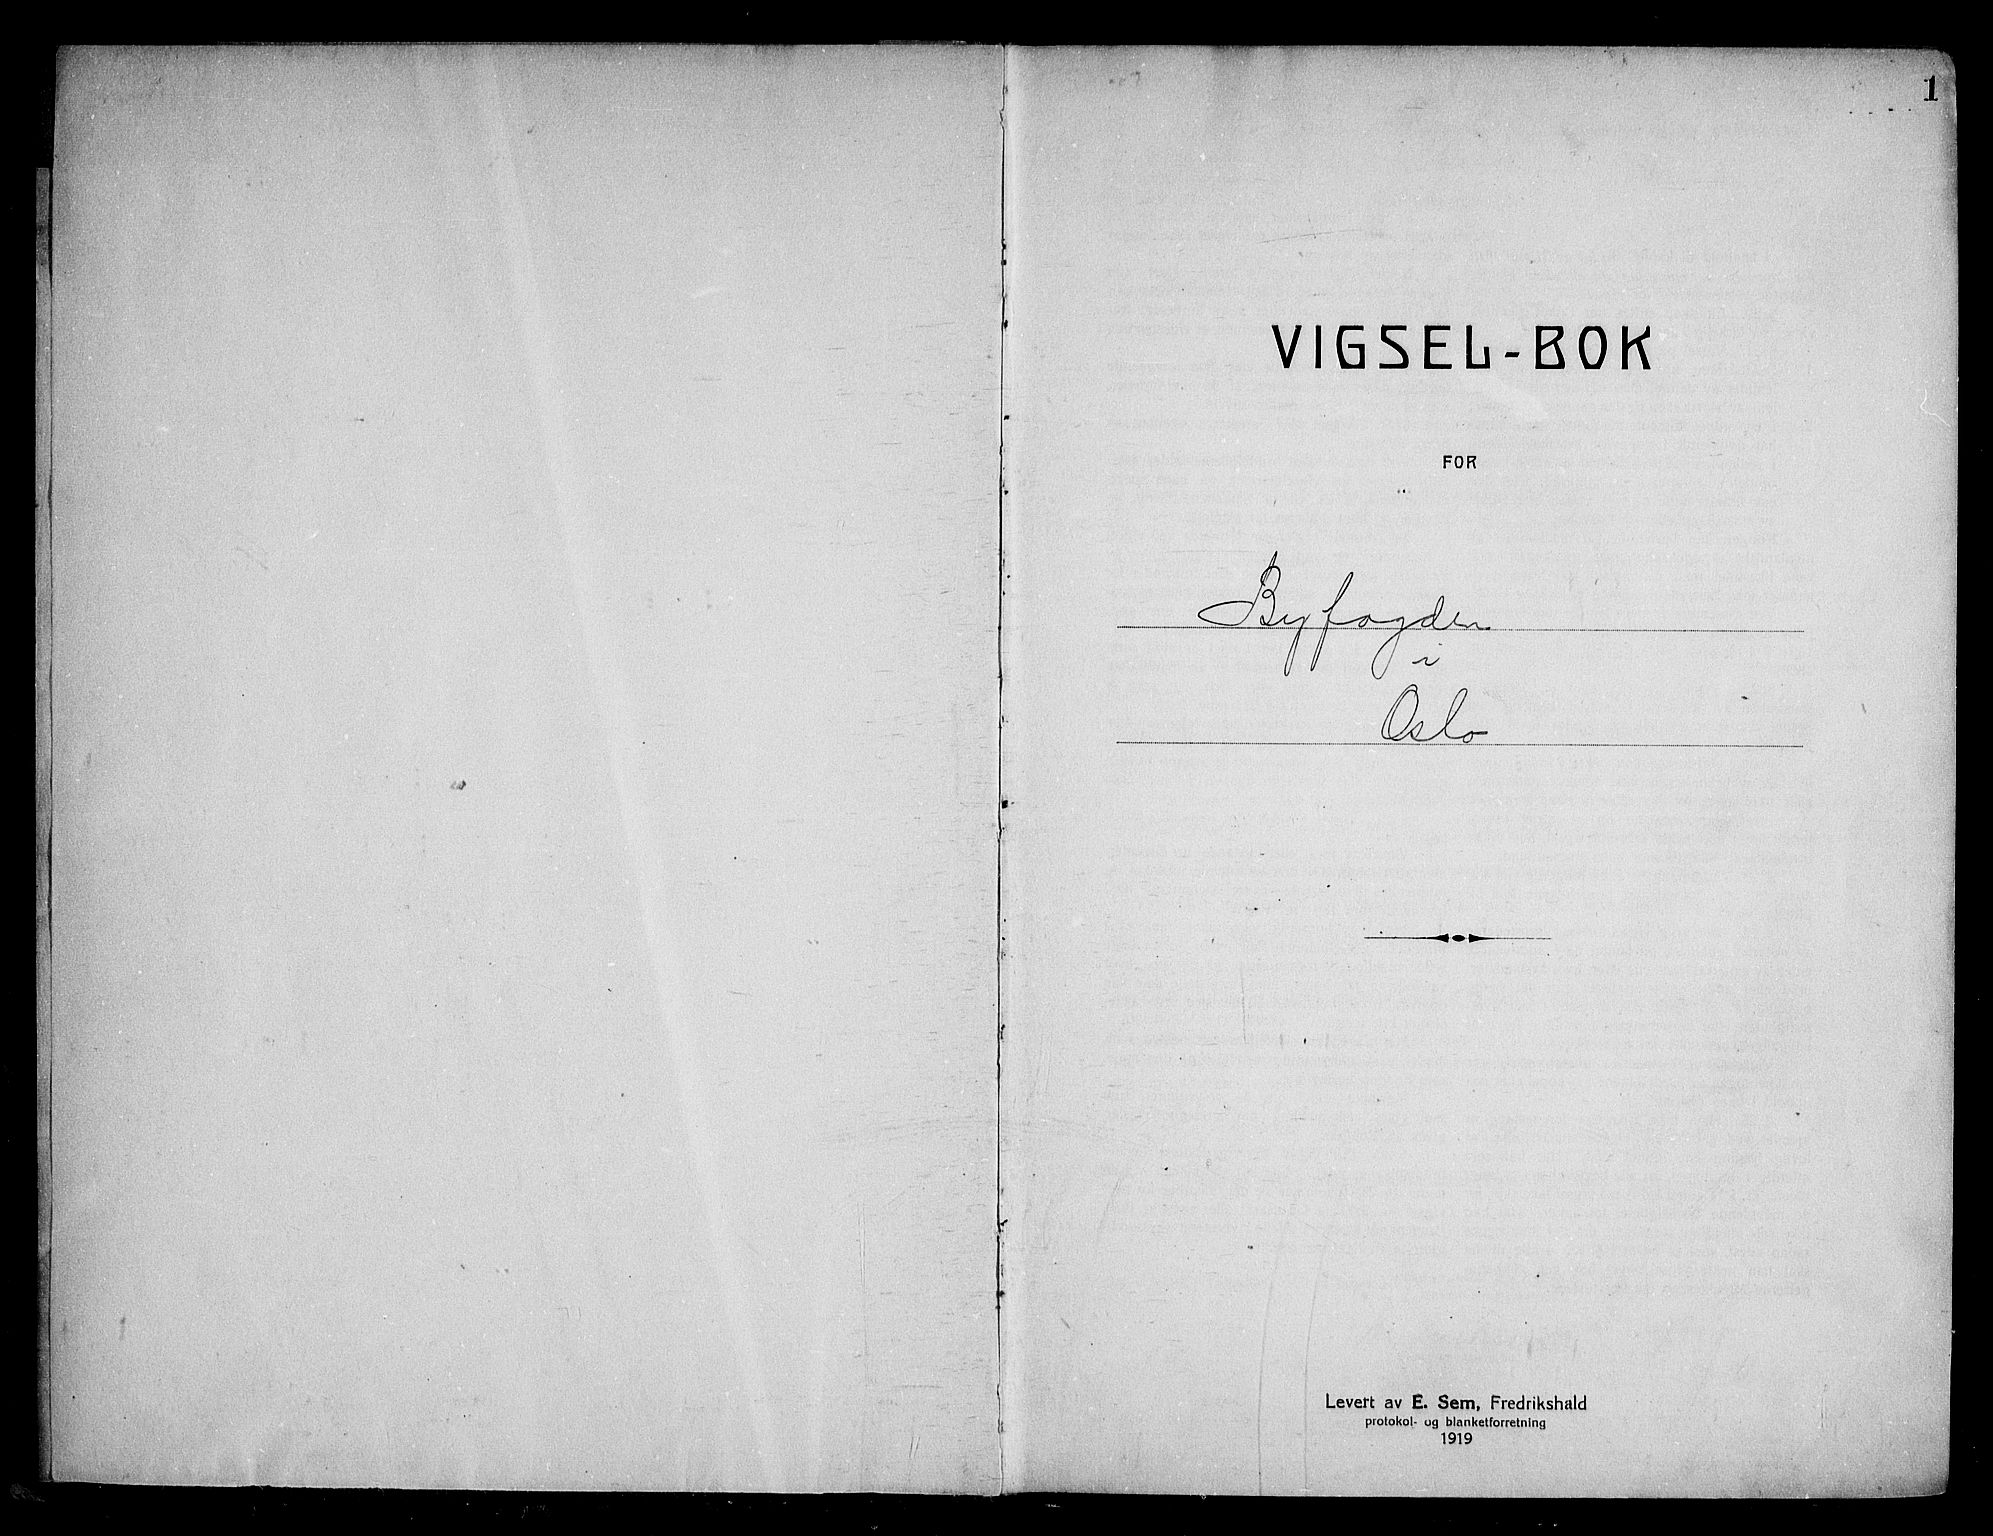 SAO, Oslo byfogd avd. I, L/Lb/Lbb/L0019: Notarialprotokoll, rekke II: Vigsler, 1928-1929, s. 1a